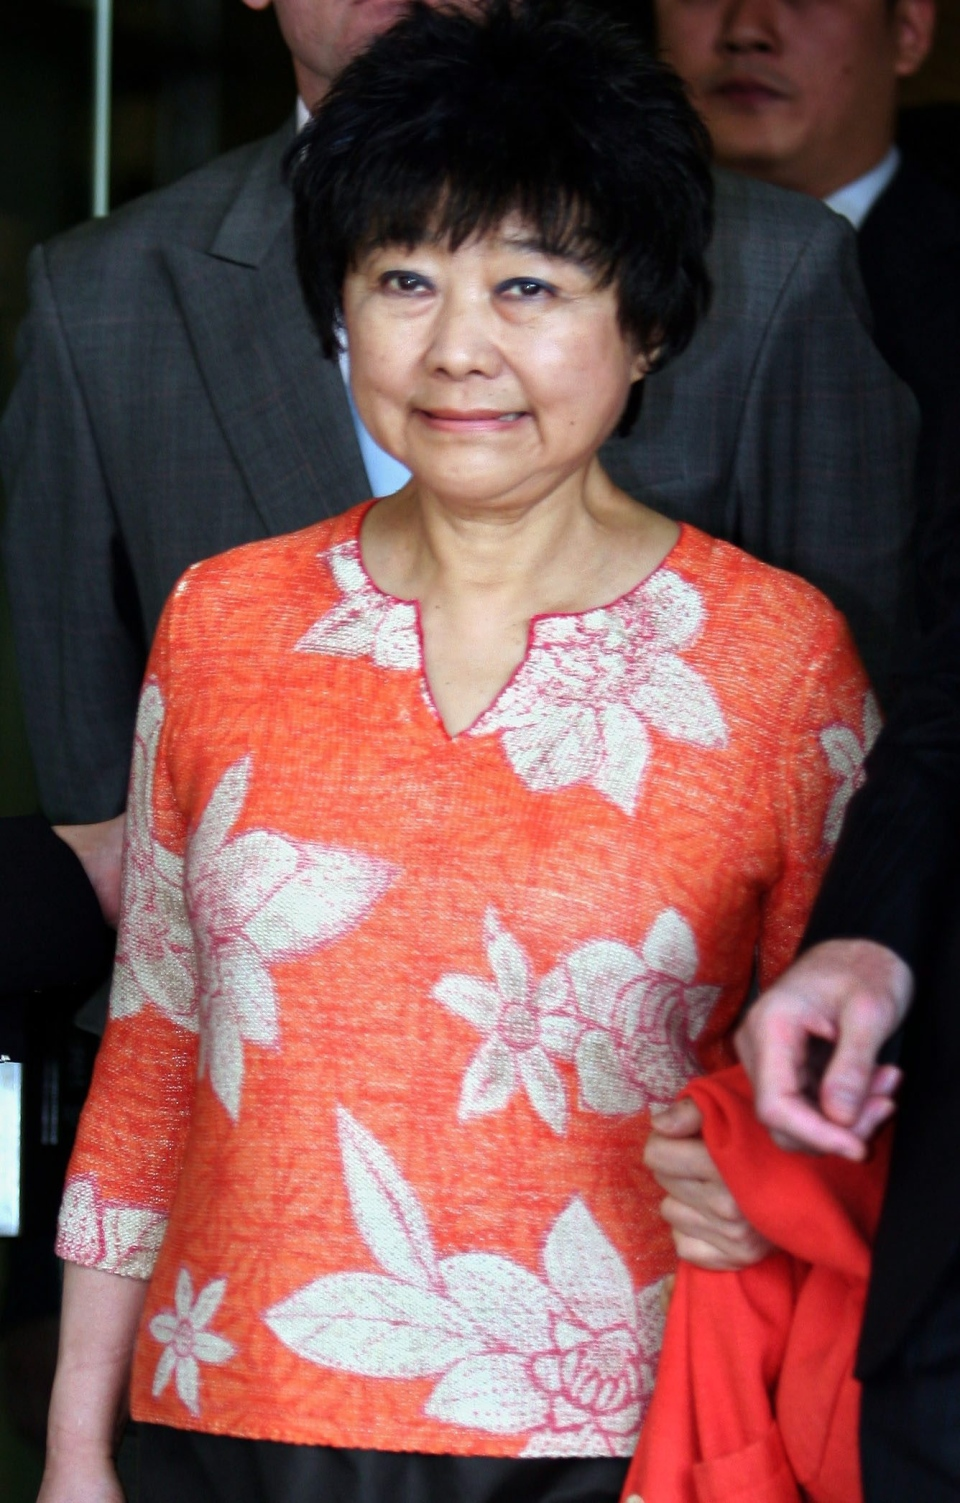 Guilty Of Forging Will Dead Hong Kong Billionaire S Lover